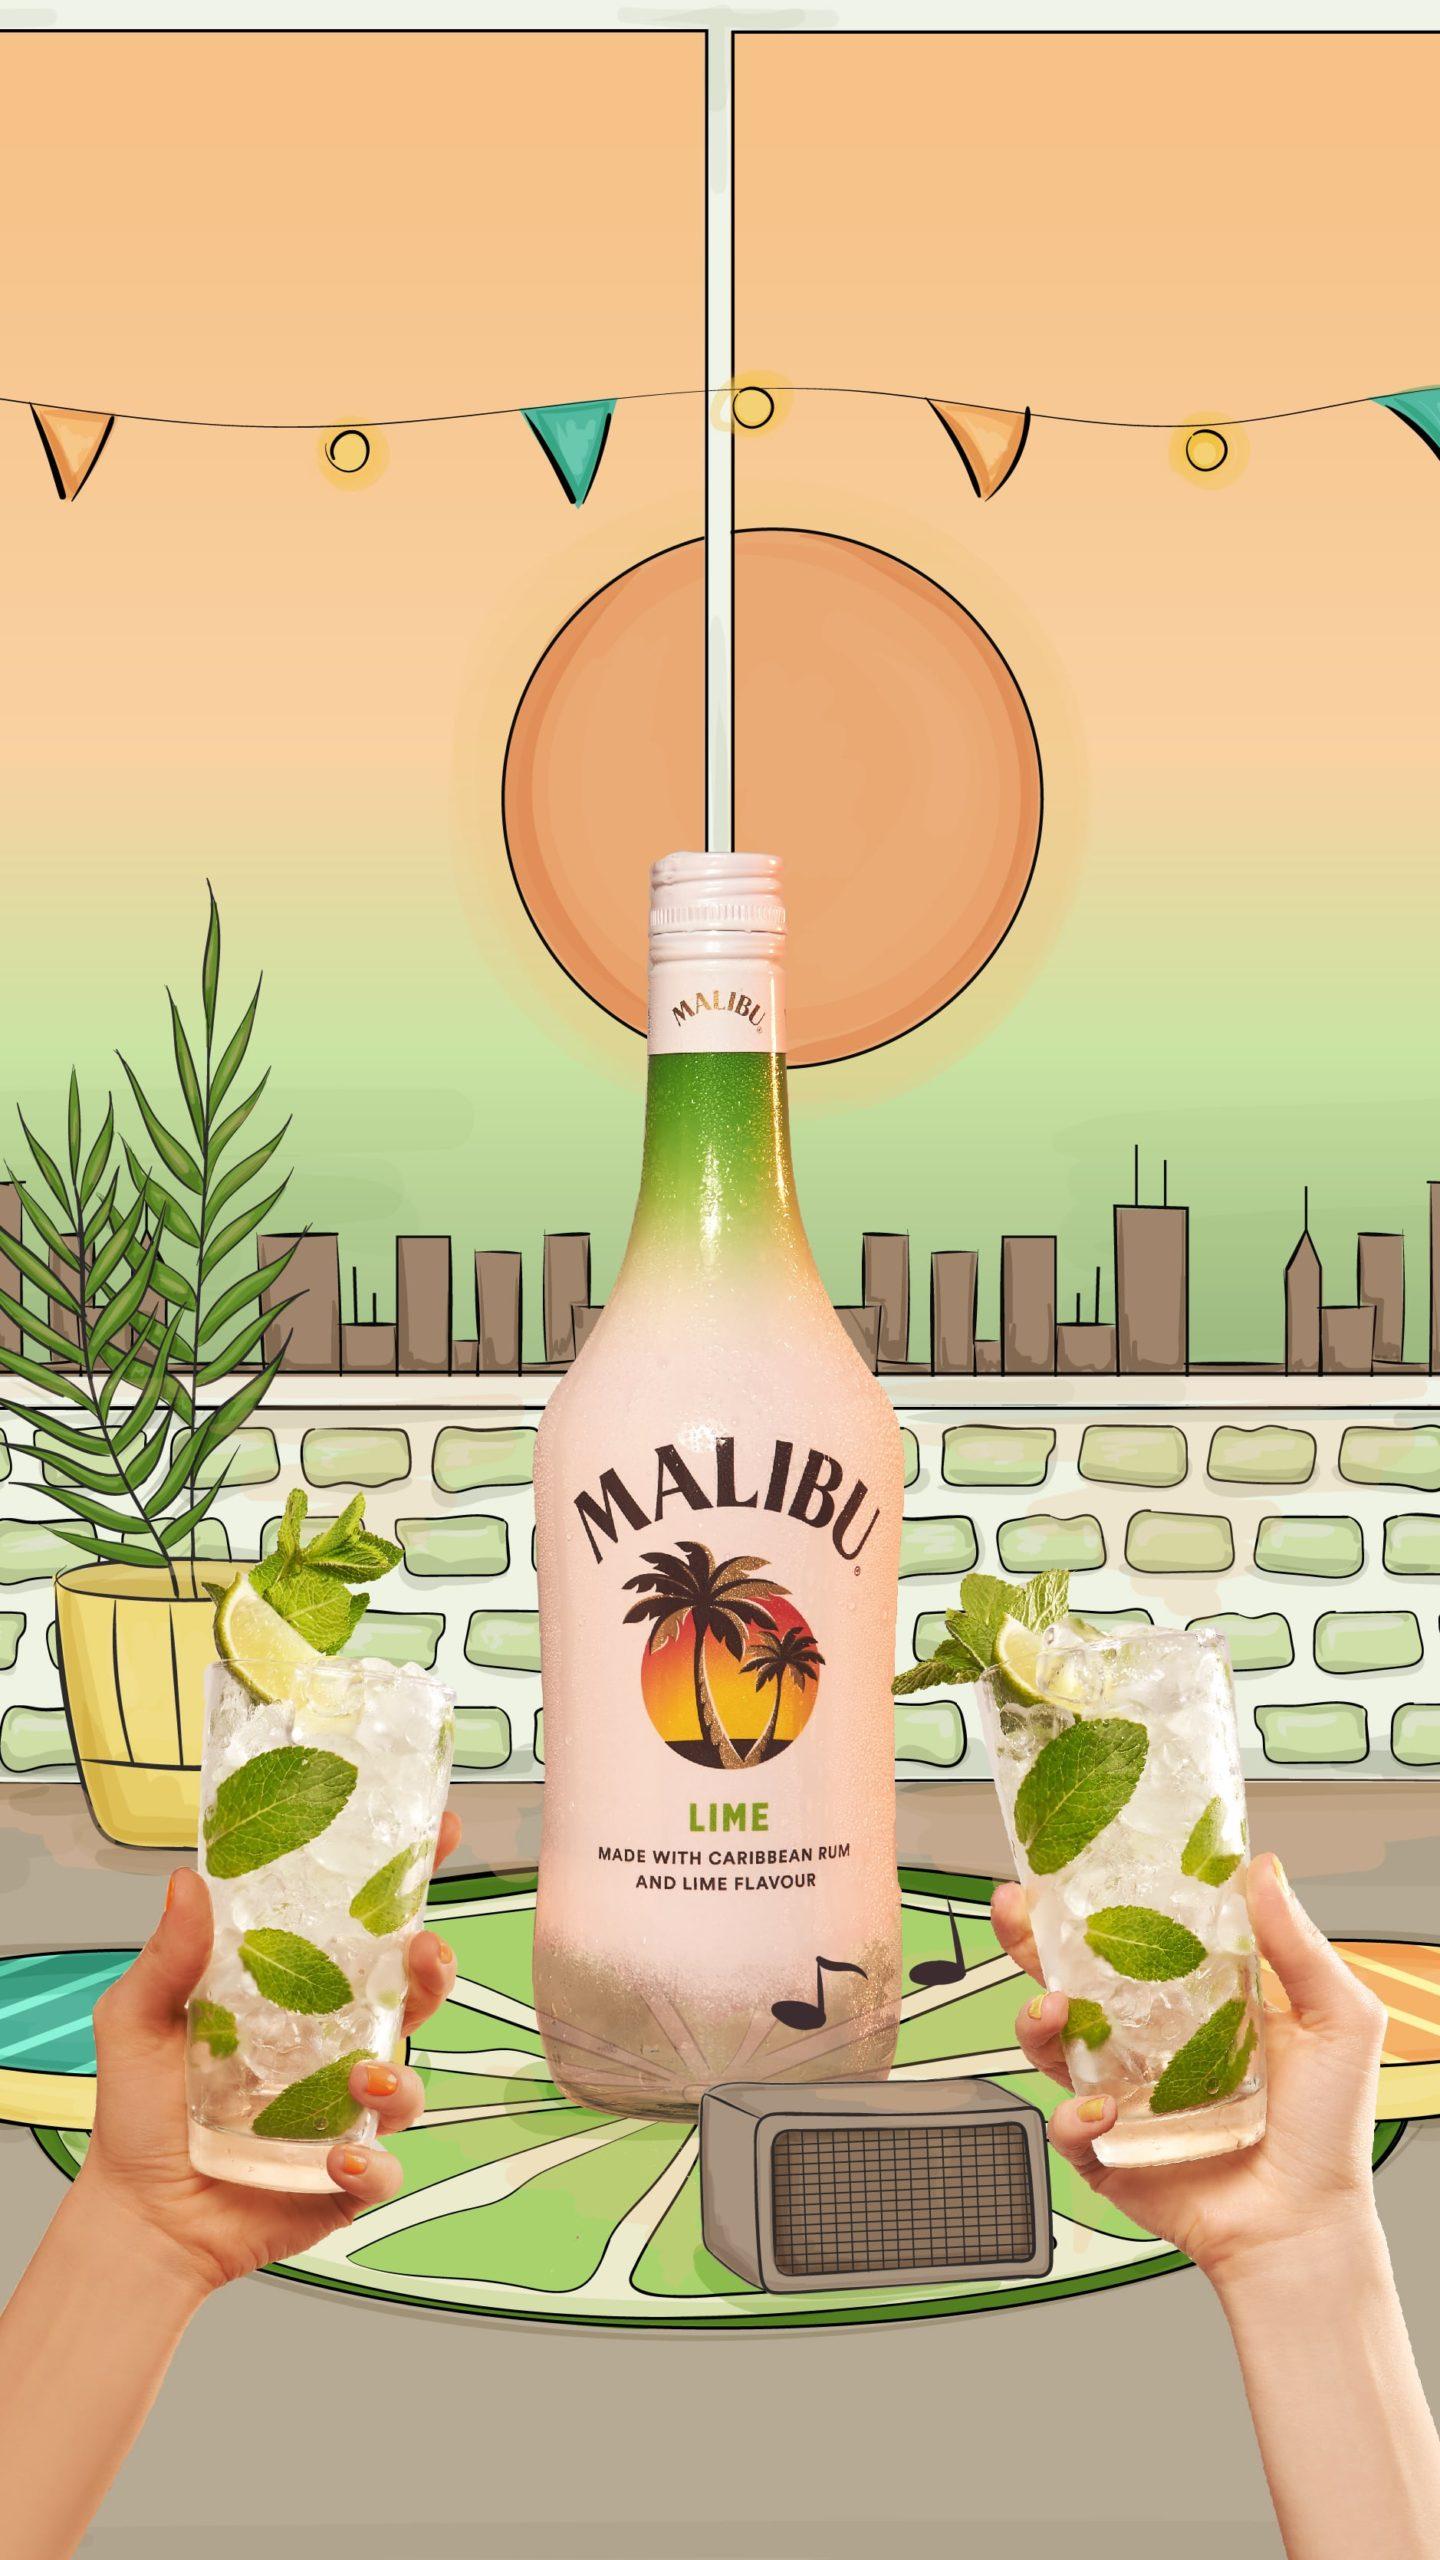 kateillustrate for Malibu Rum